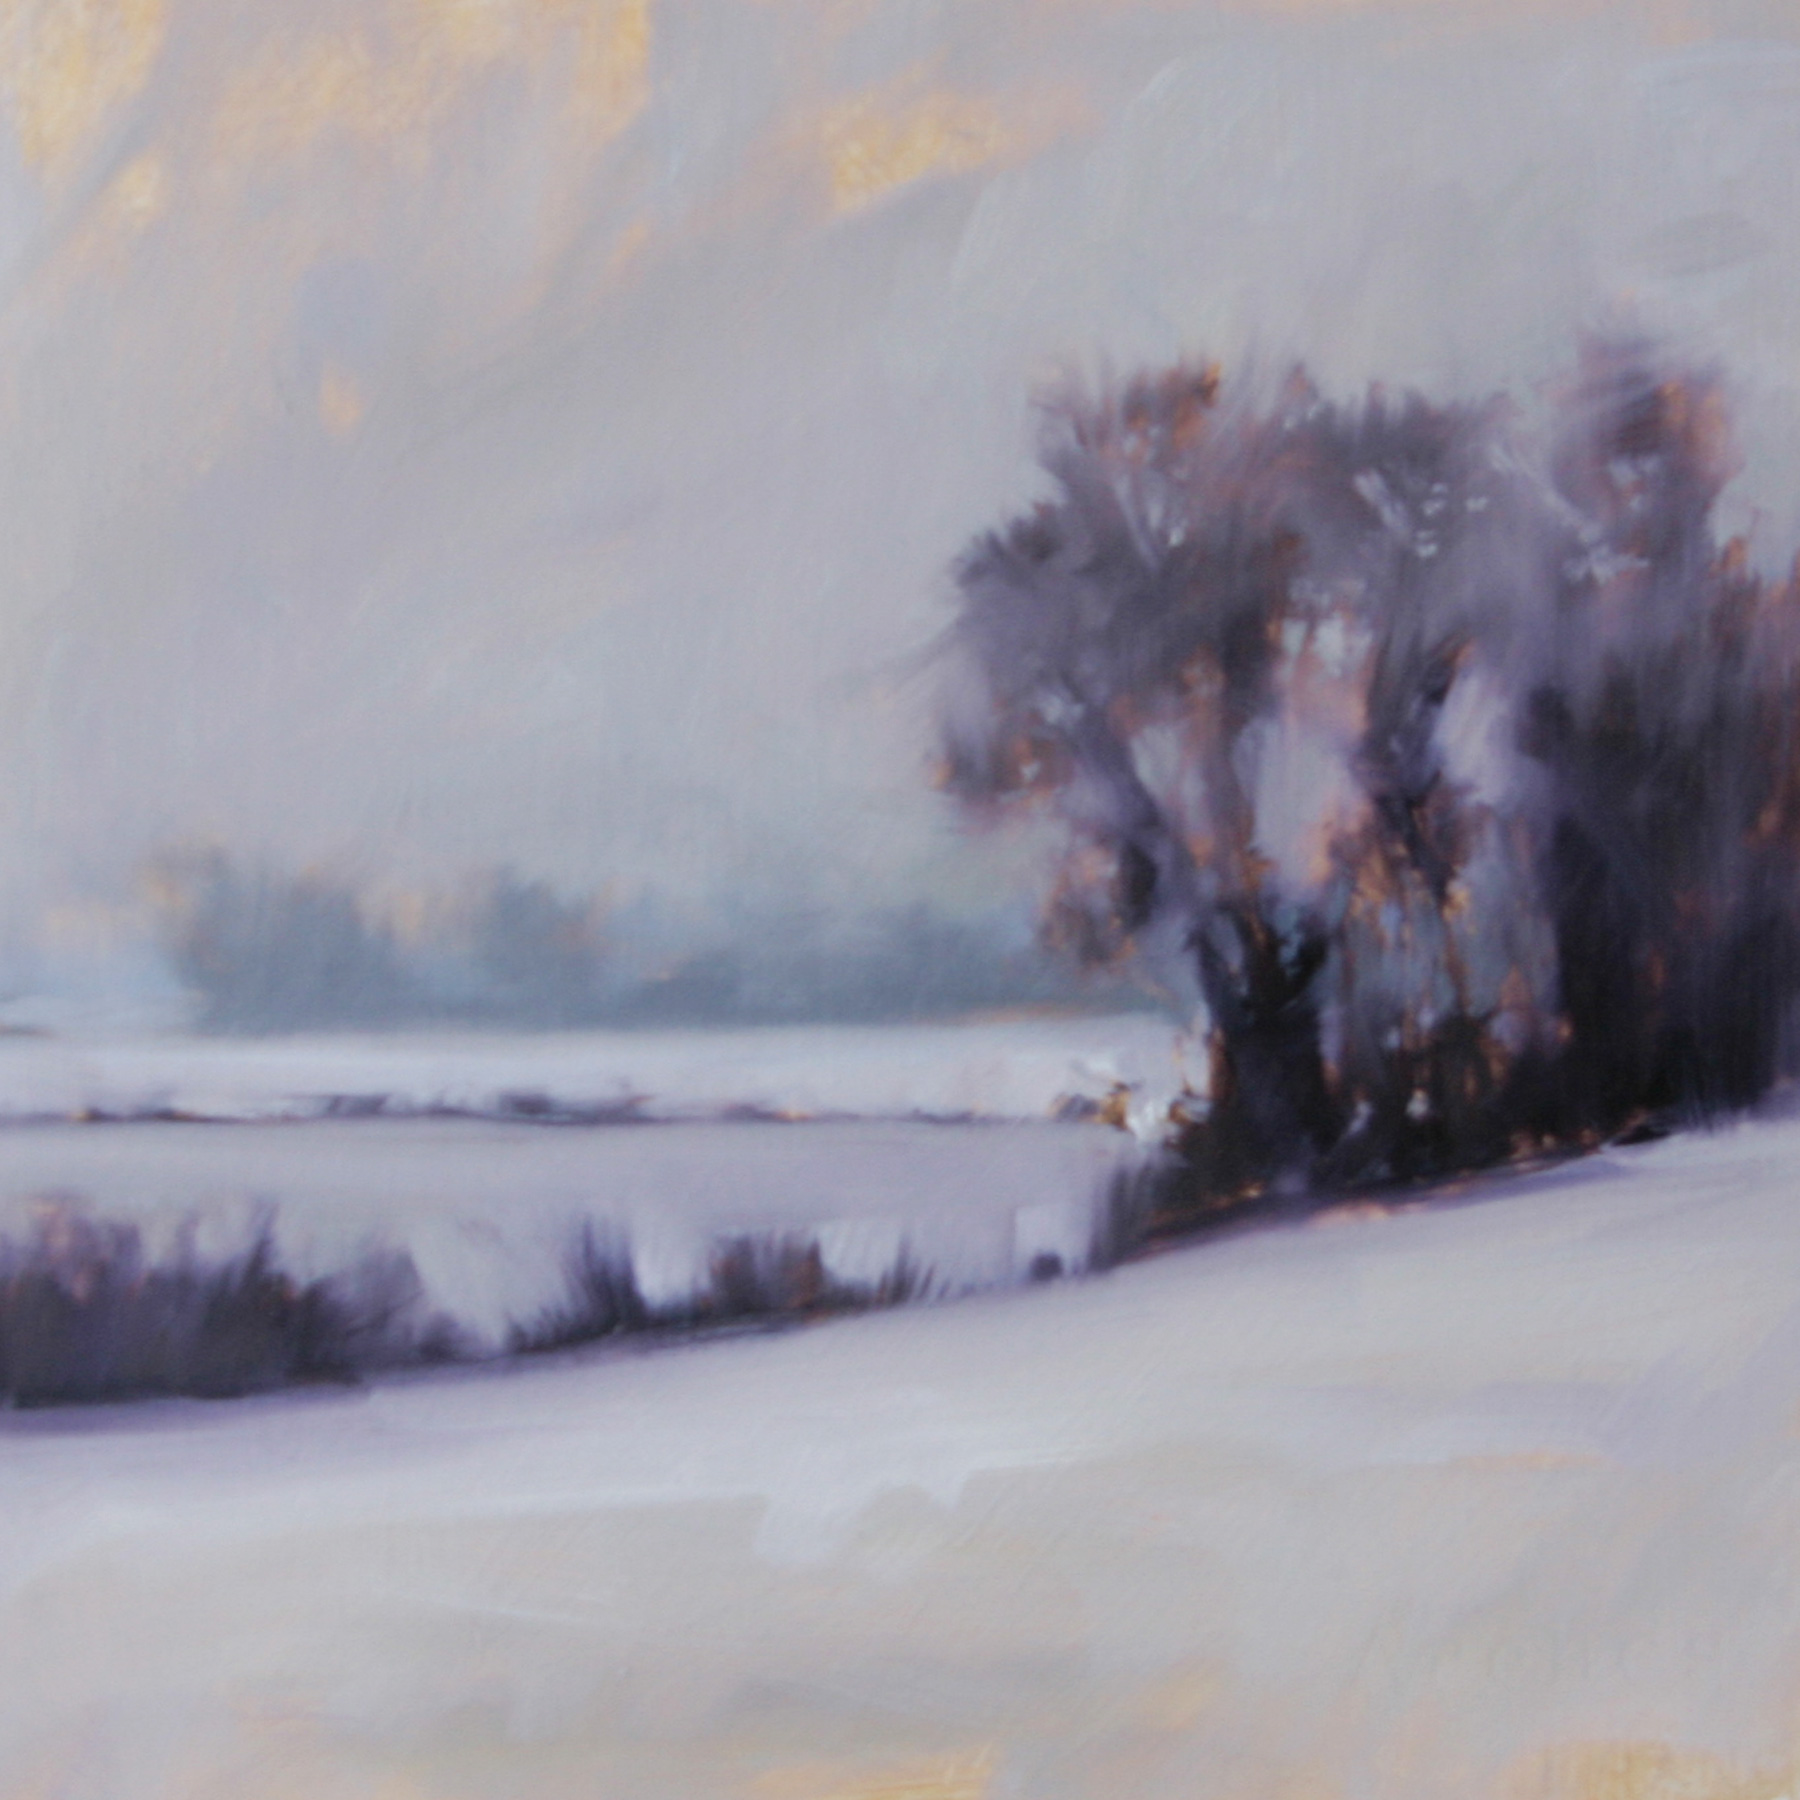 Winter study (trees), oil on paper, 10 x 10